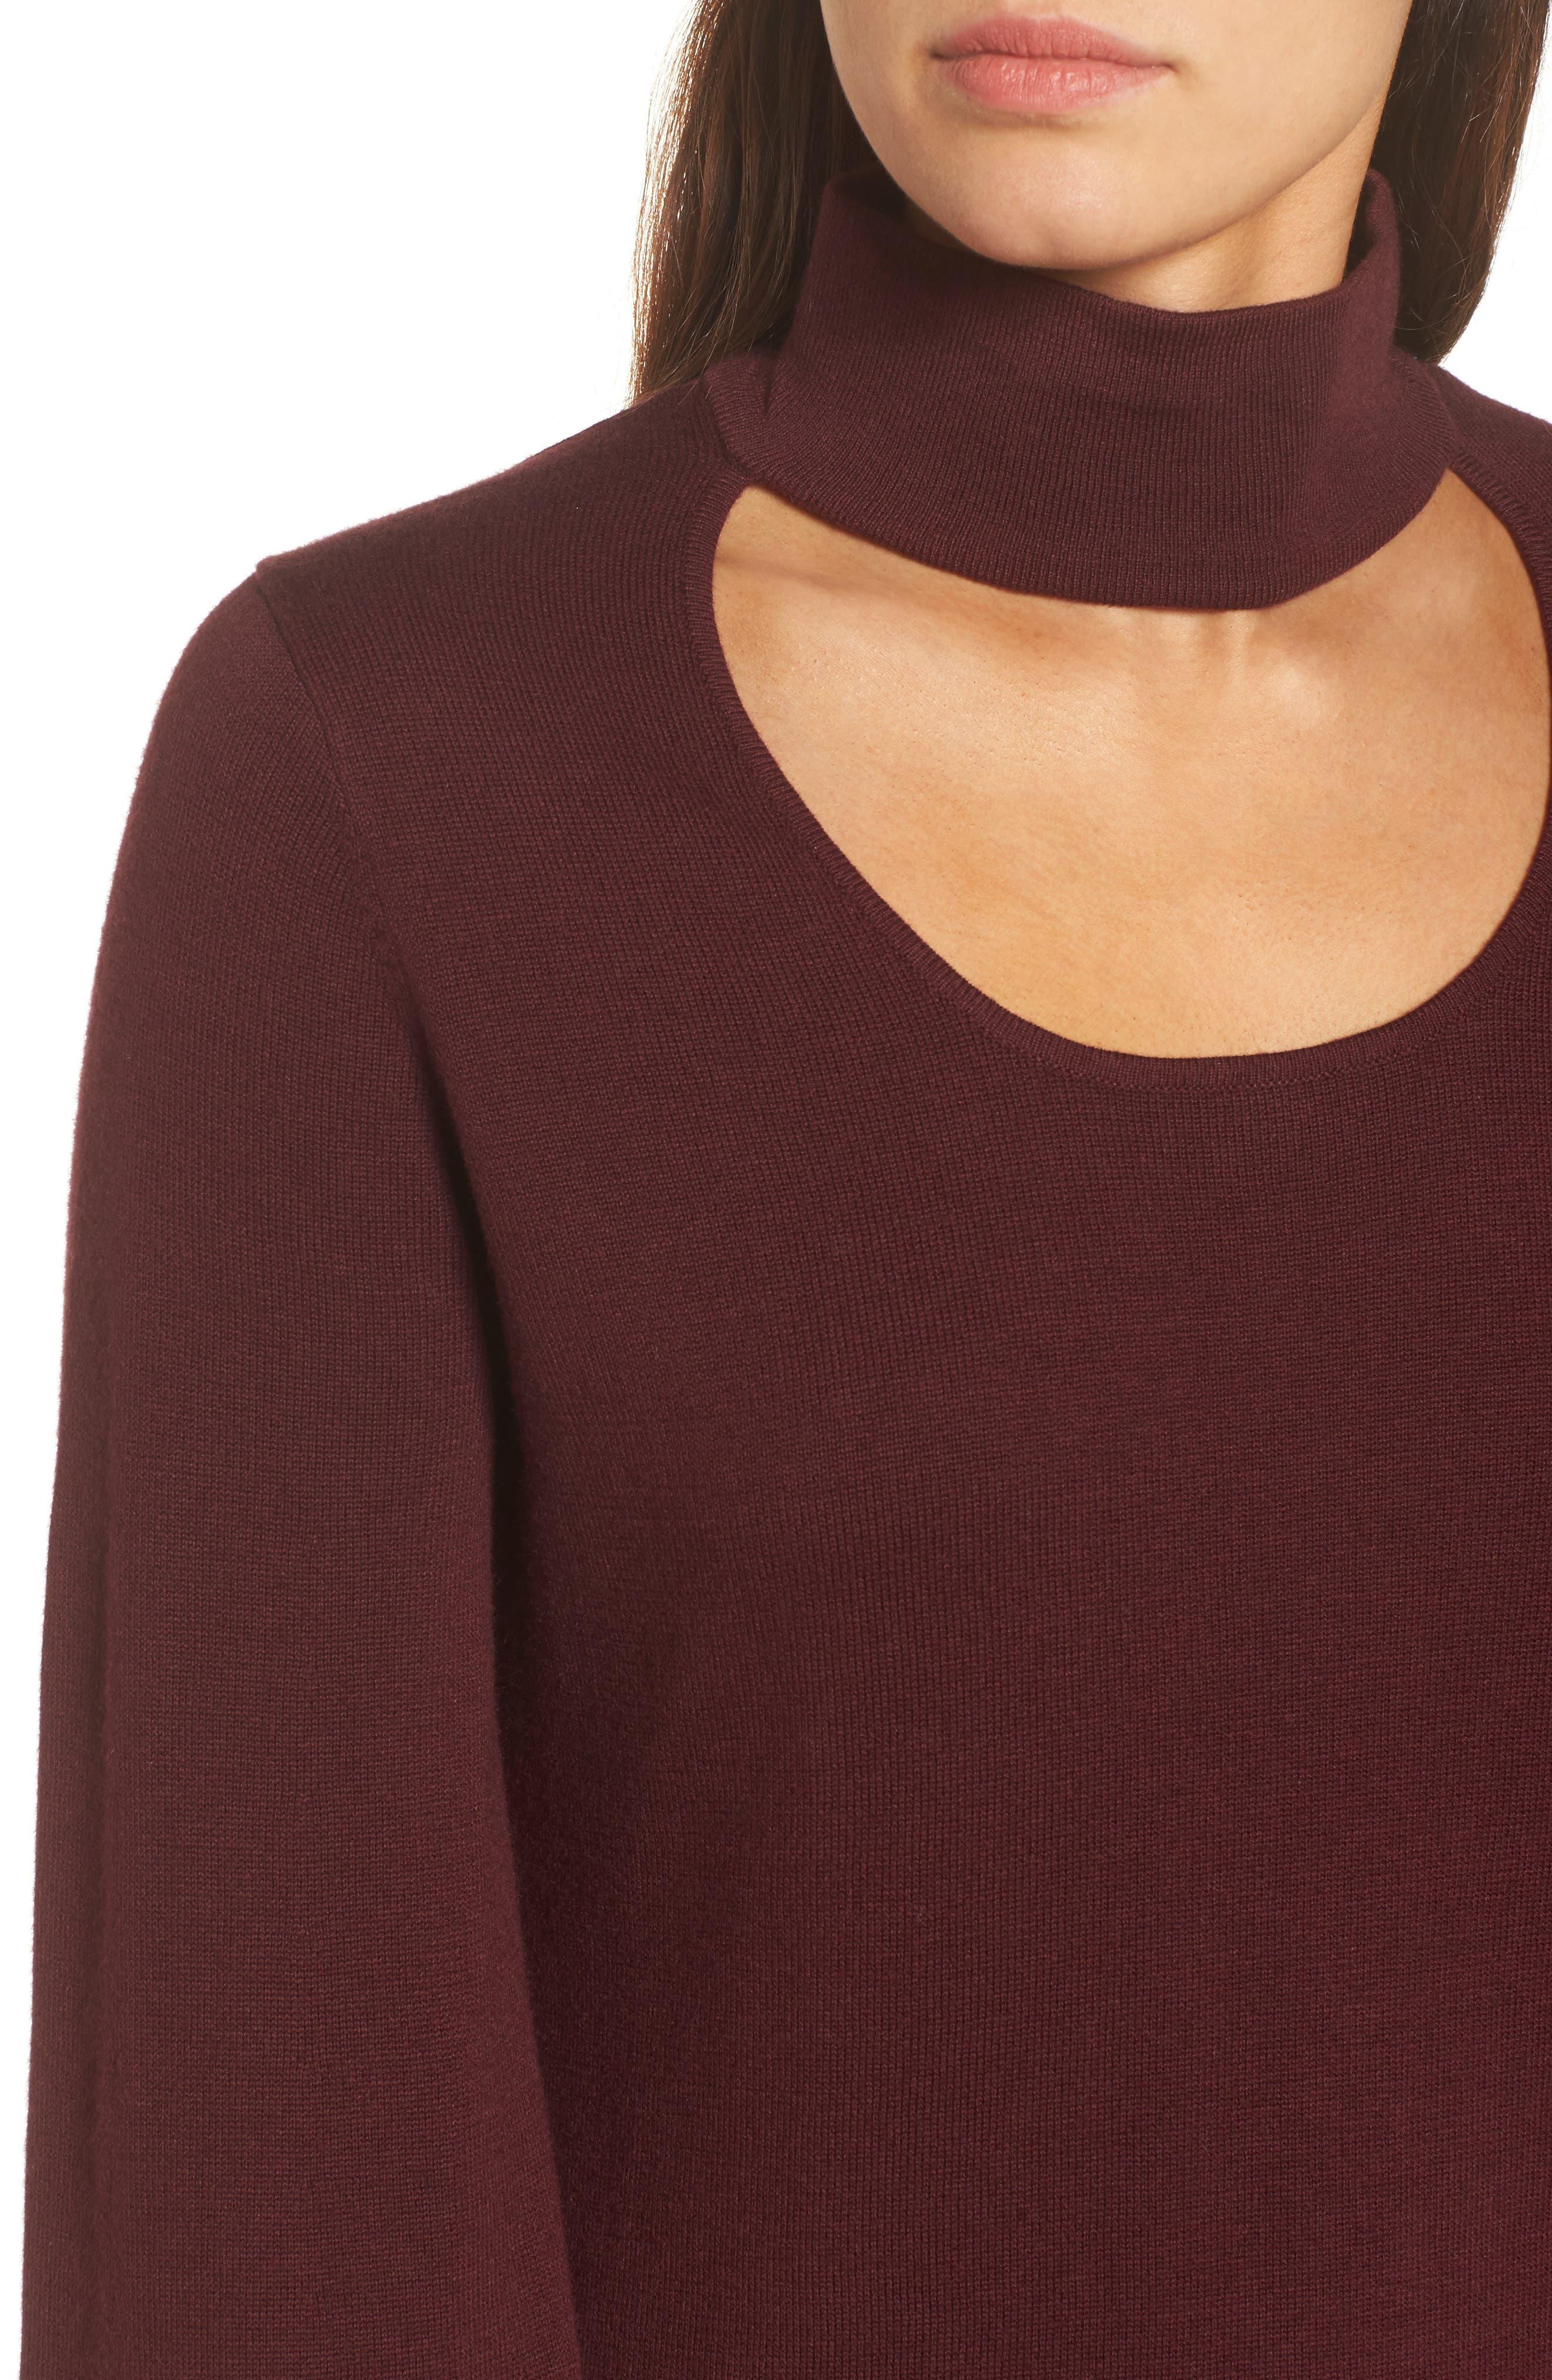 Bell Sleeve Choker Neck Sweater,                             Alternate thumbnail 19, color,